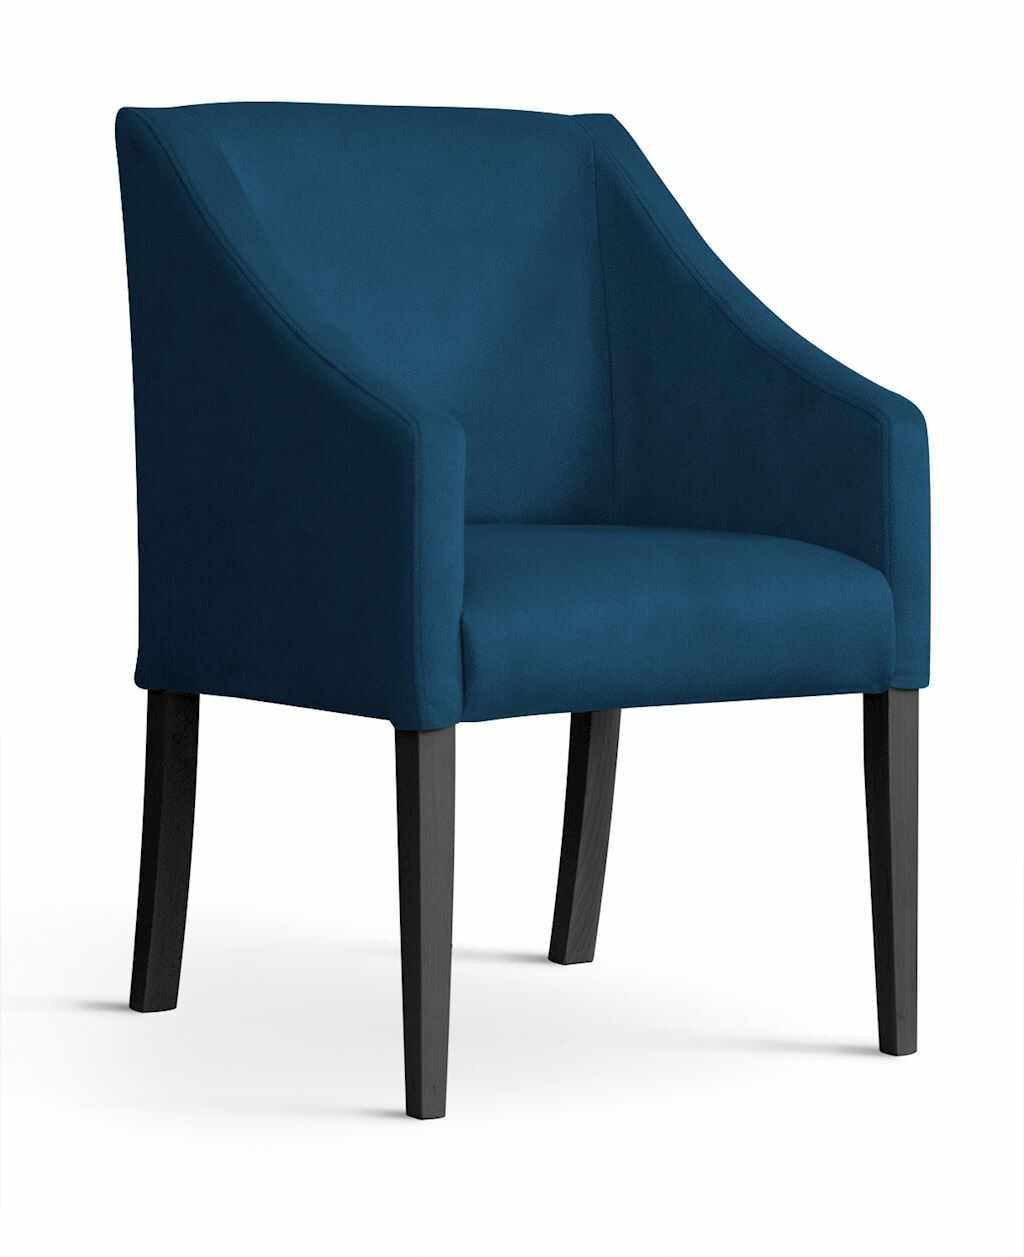 Fotoliu fix tapitat cu stofa, cu picioare din lemn Capri Navy Blue / Black, l58xA60xH89 cm la pret 686 lei